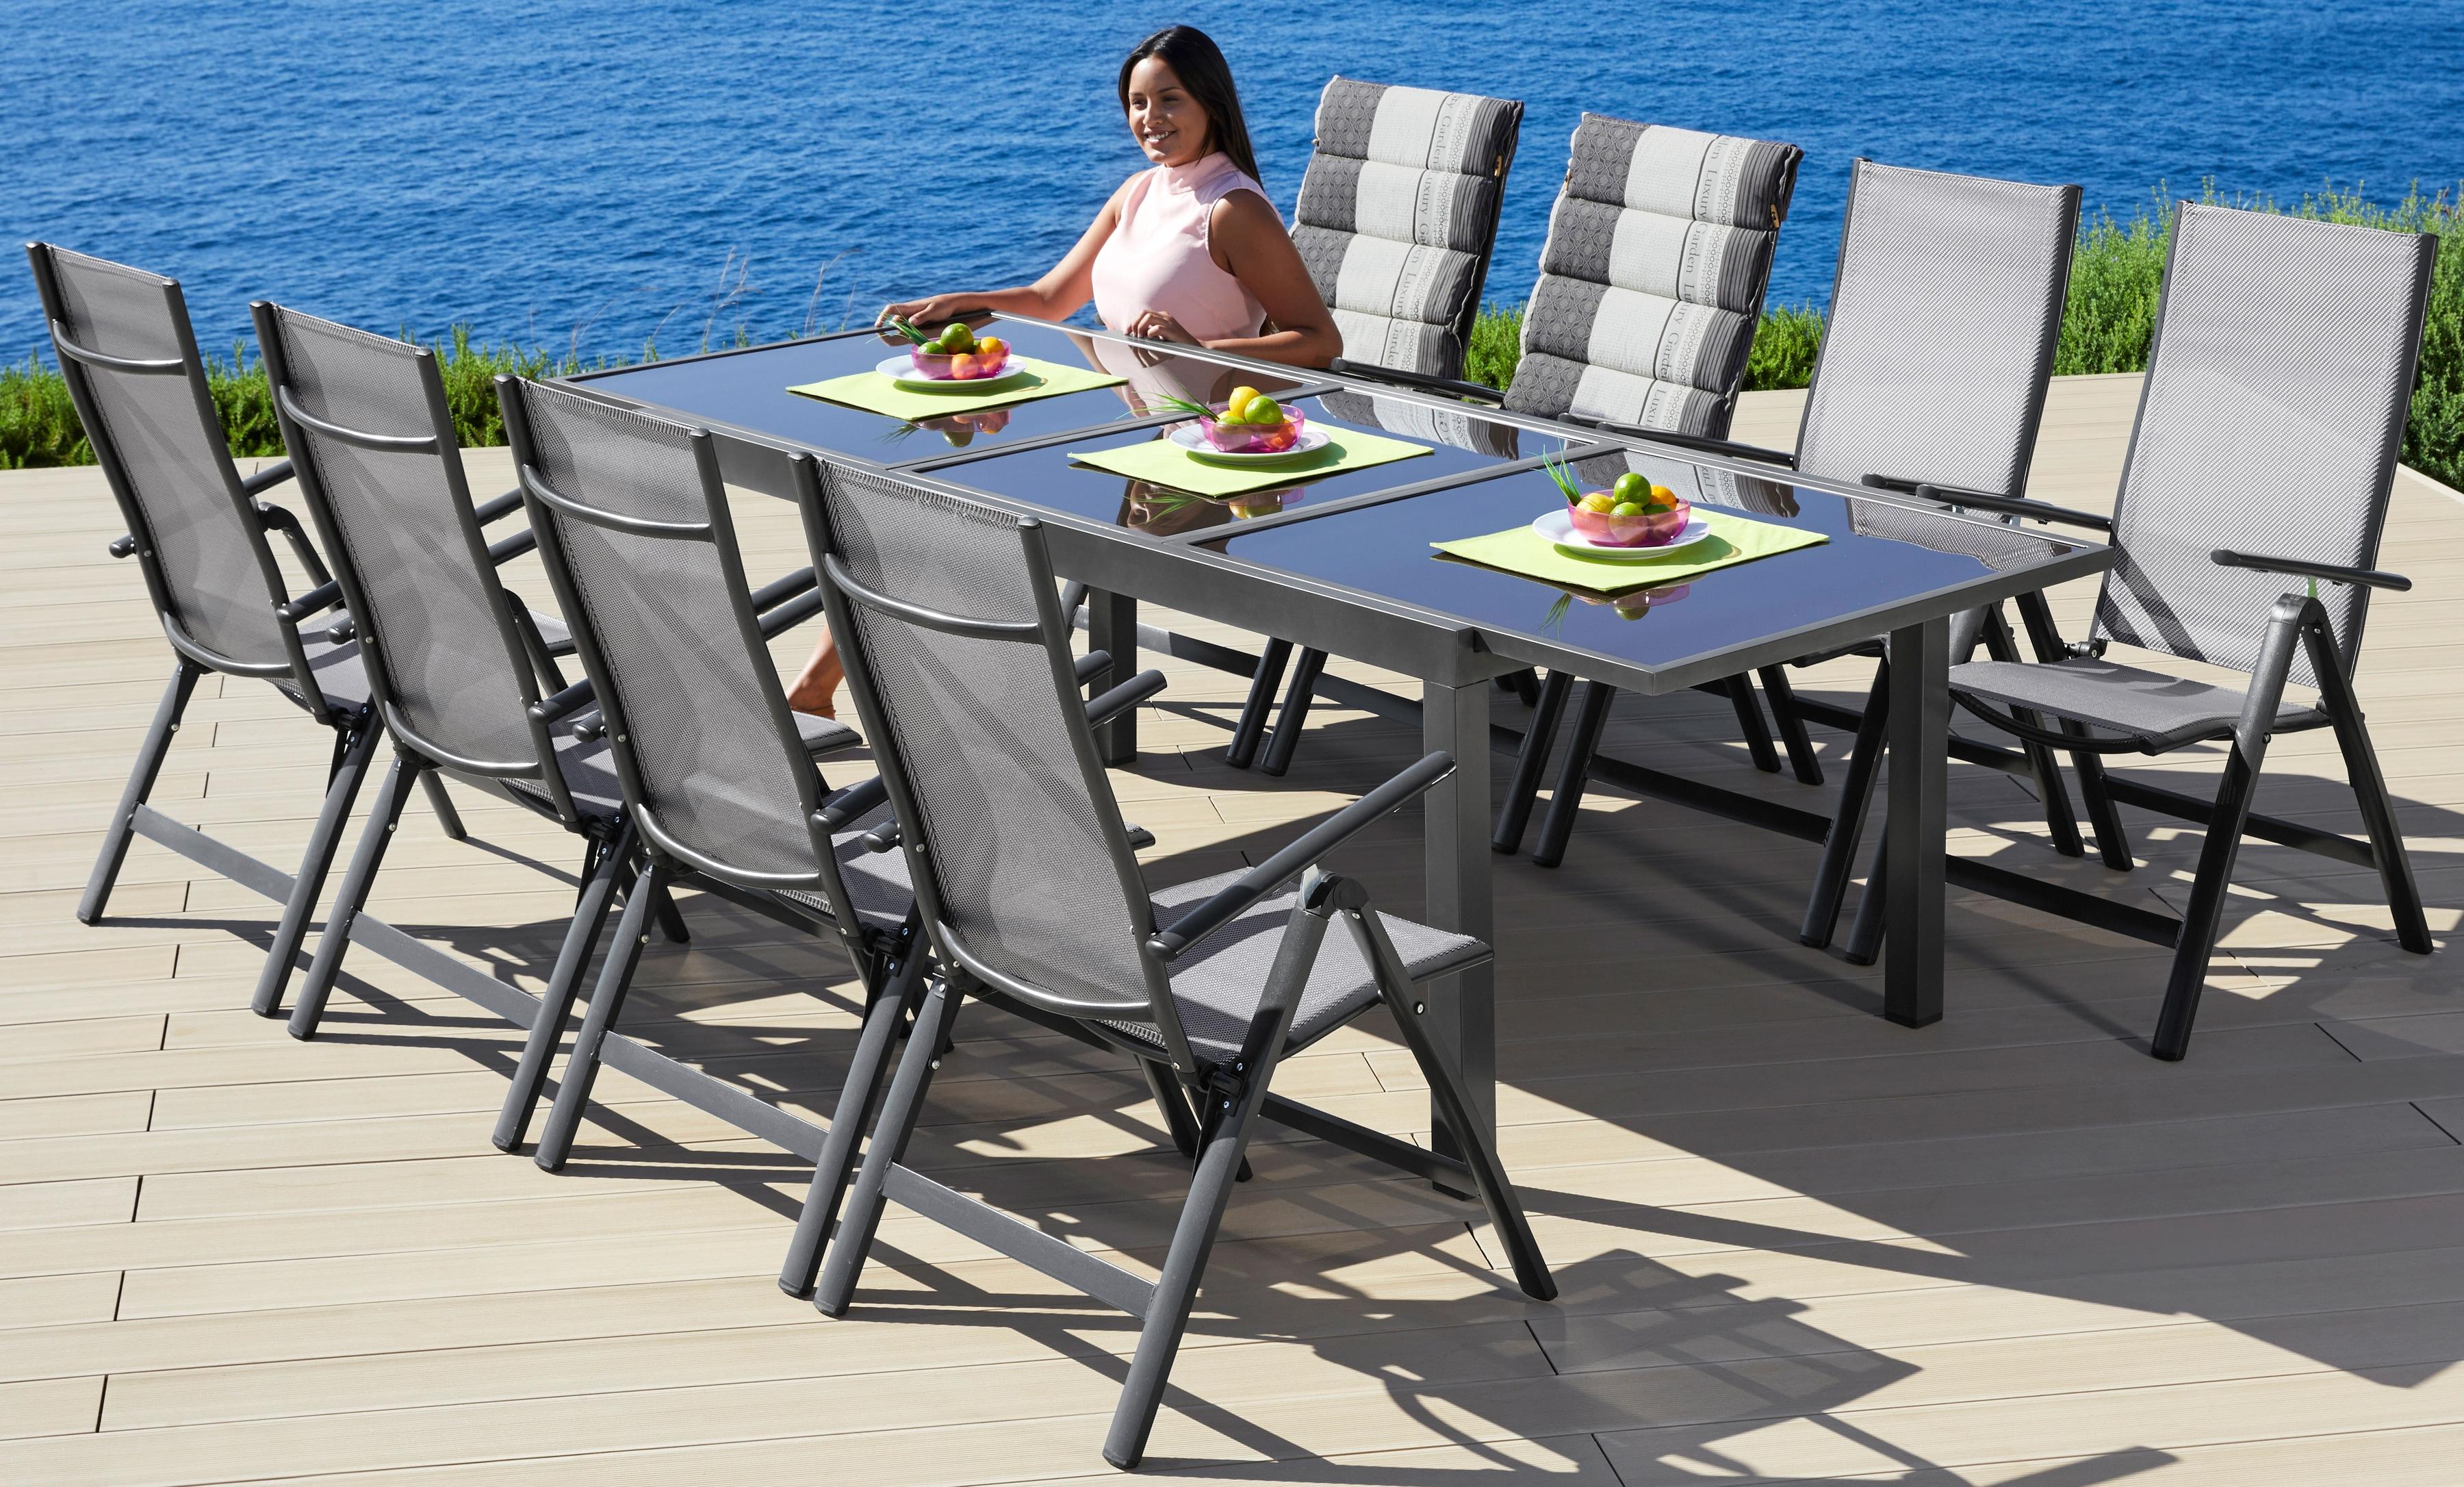 MERXX Gartenmöbelset Amalfi 9-tlg 8 Klappsessel Tisch 100x180-240 cm Alu/Textil